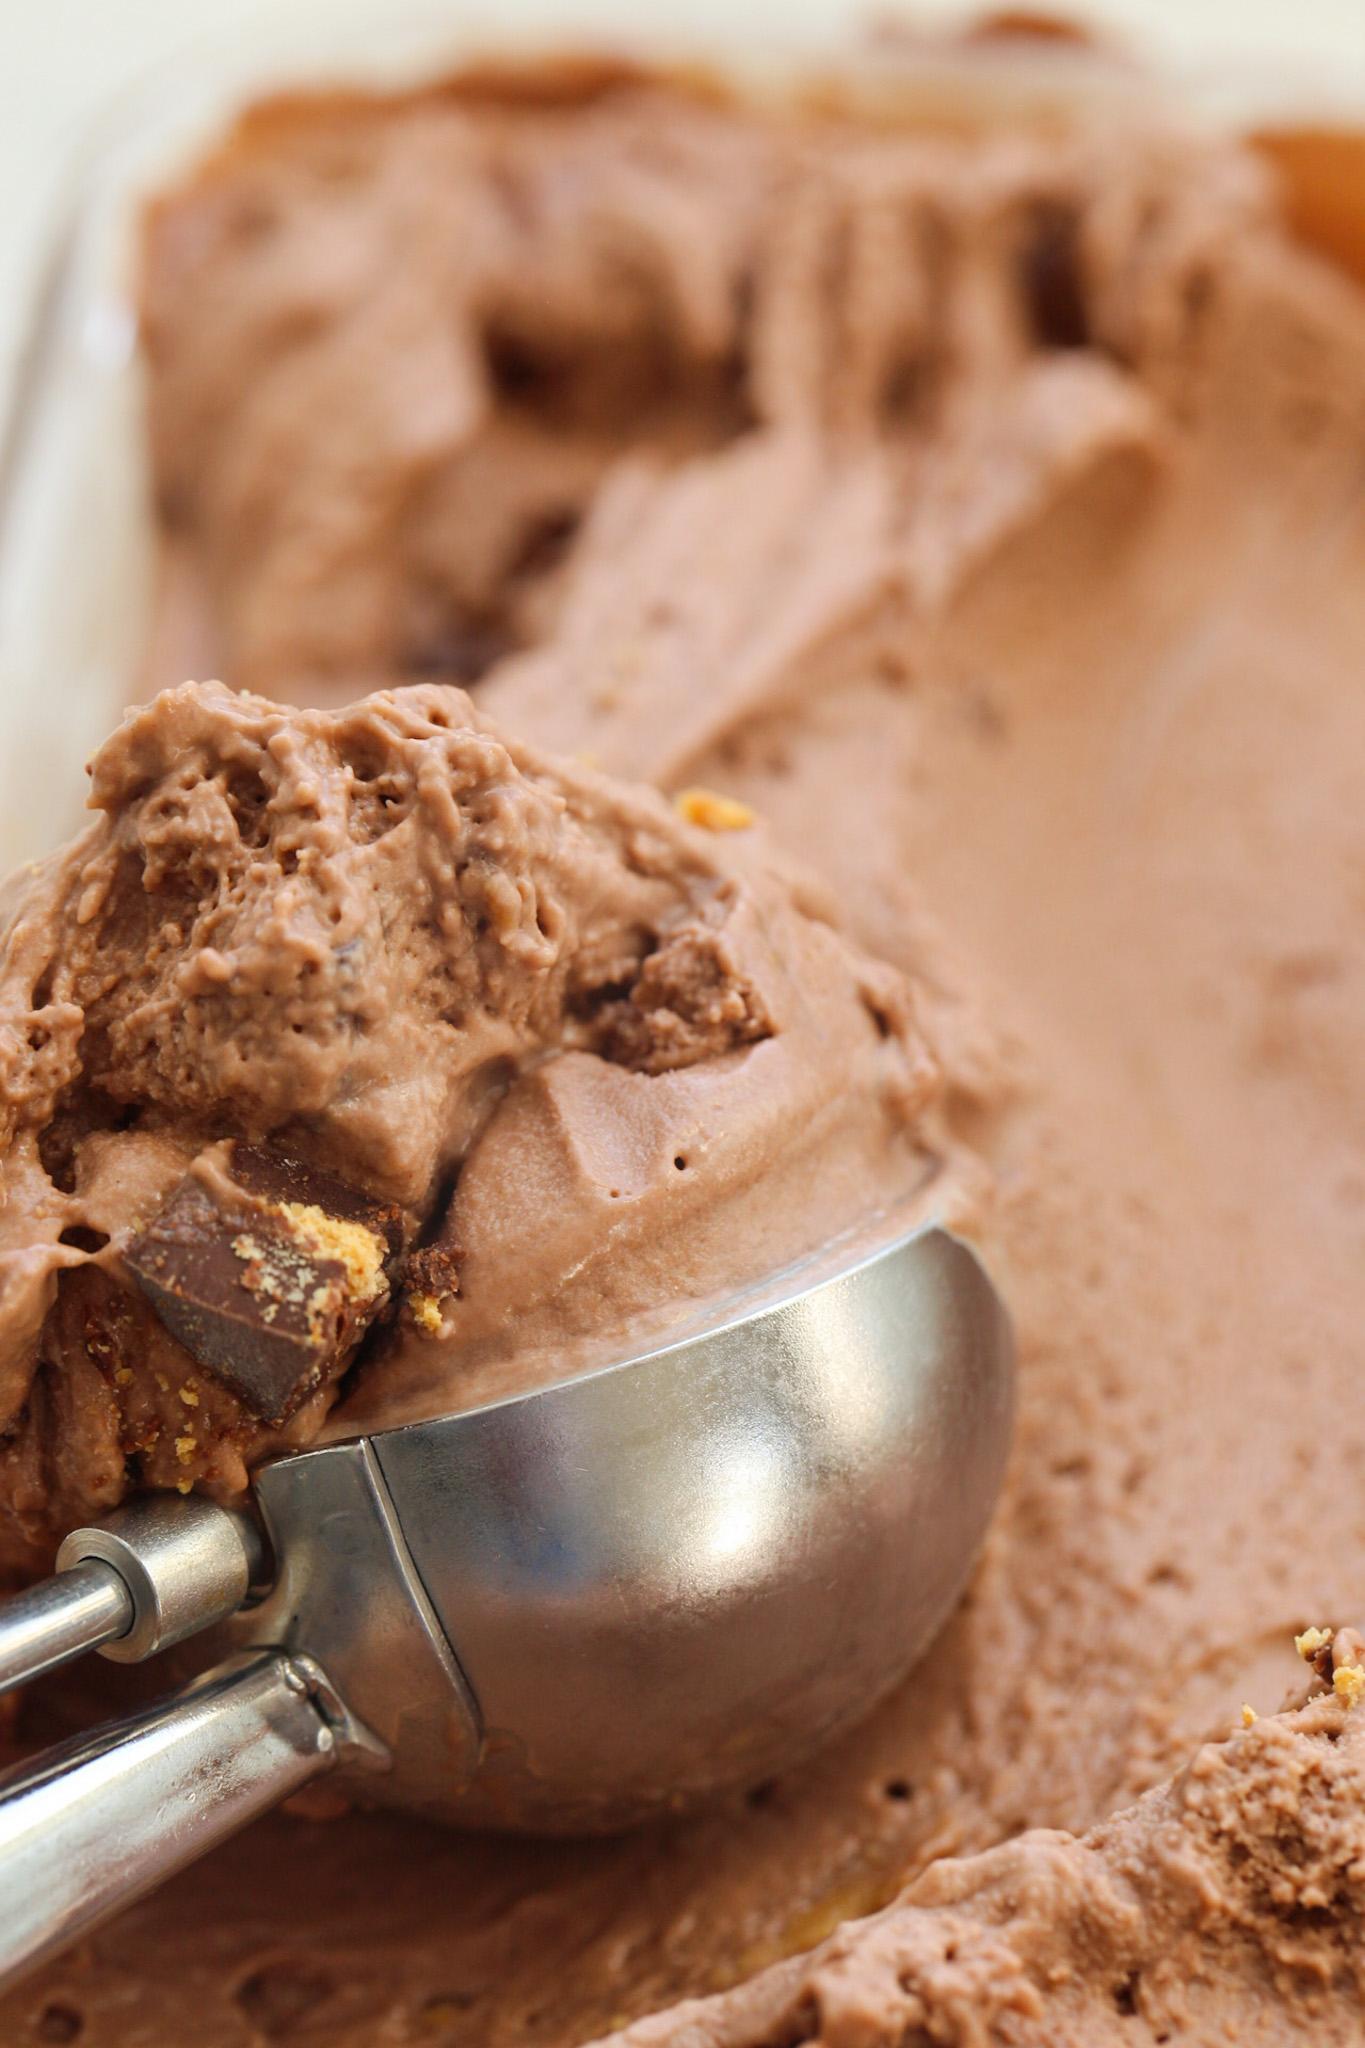 Scooping Dairy-Free Chocolate Peanut Butter Ice Cream